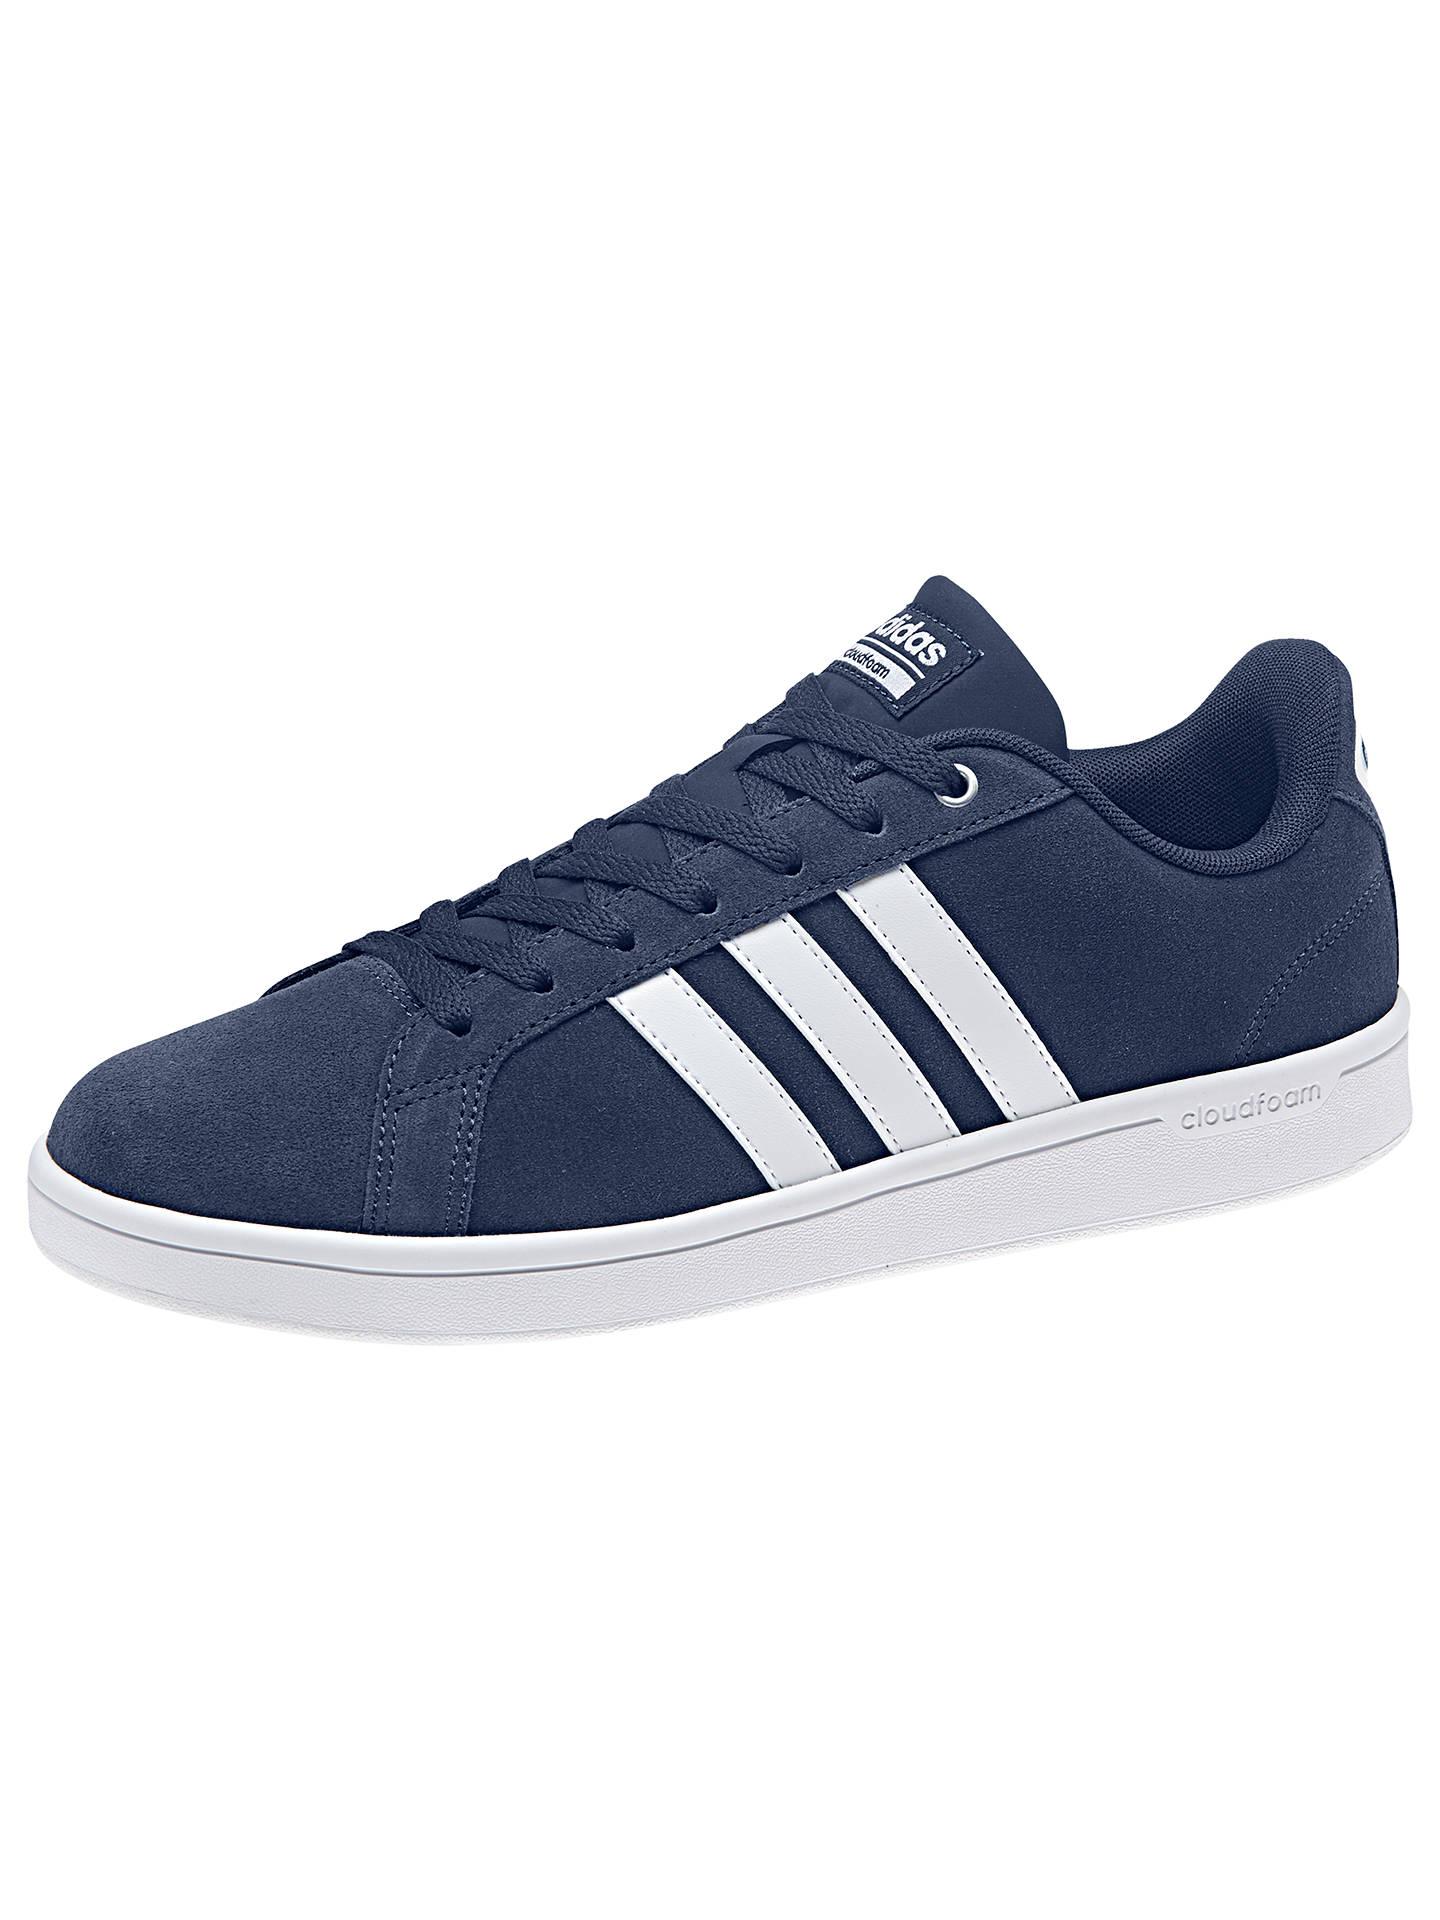 on sale 80b34 2cbab ... Buy adidas Neo Cloudfoam Advantage Men s Trainers, Blue, 7 Online at  johnlewis. ...